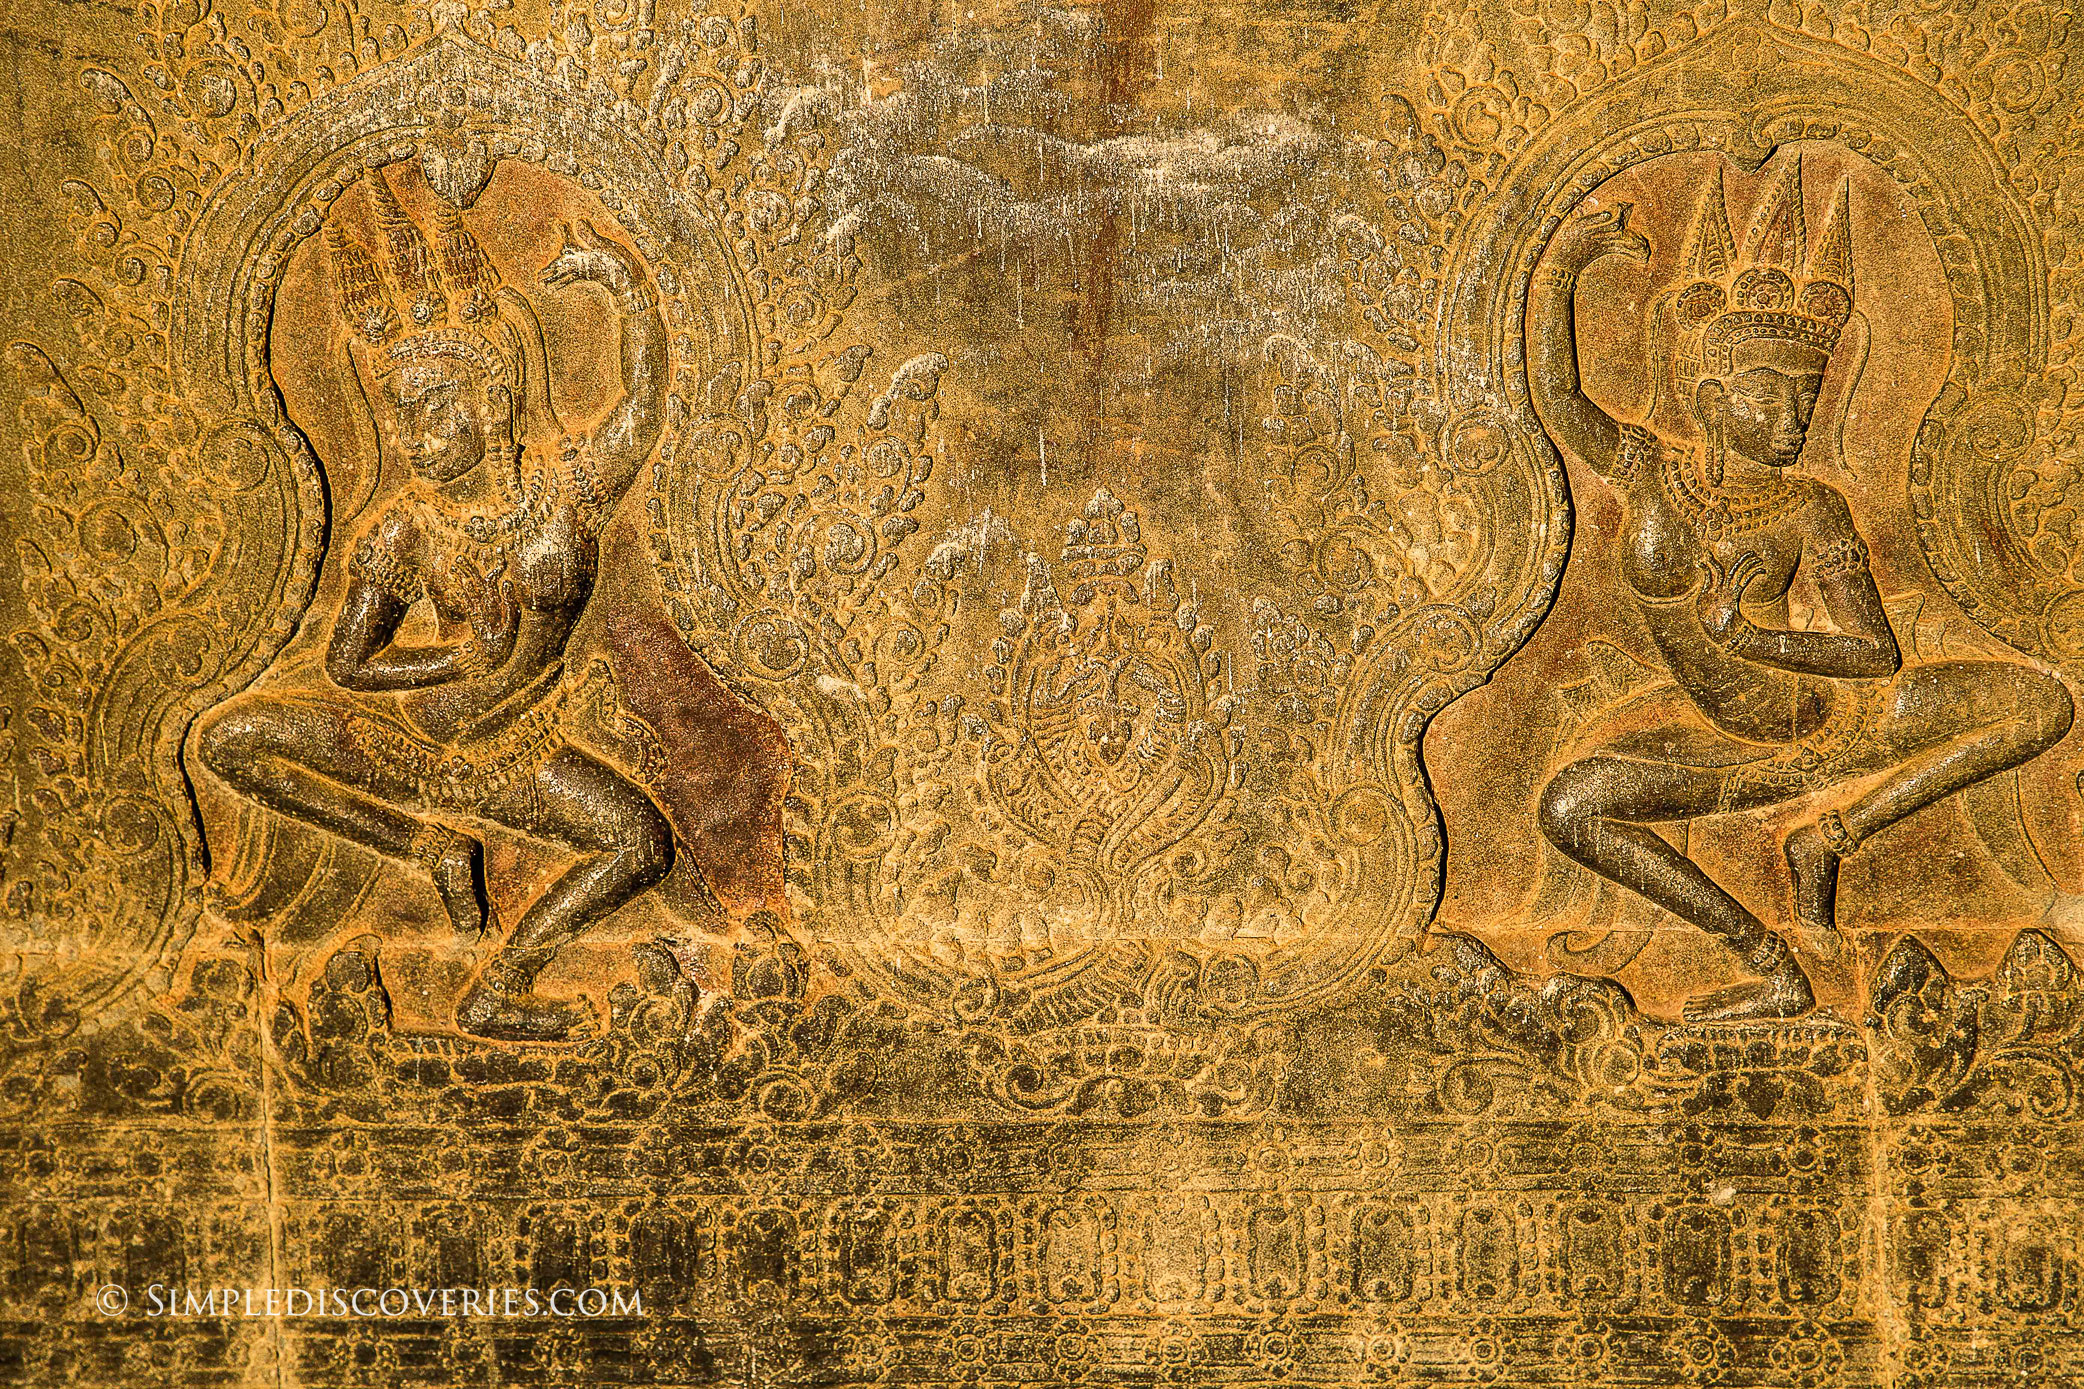 cambodia_angkor_wat_carvings